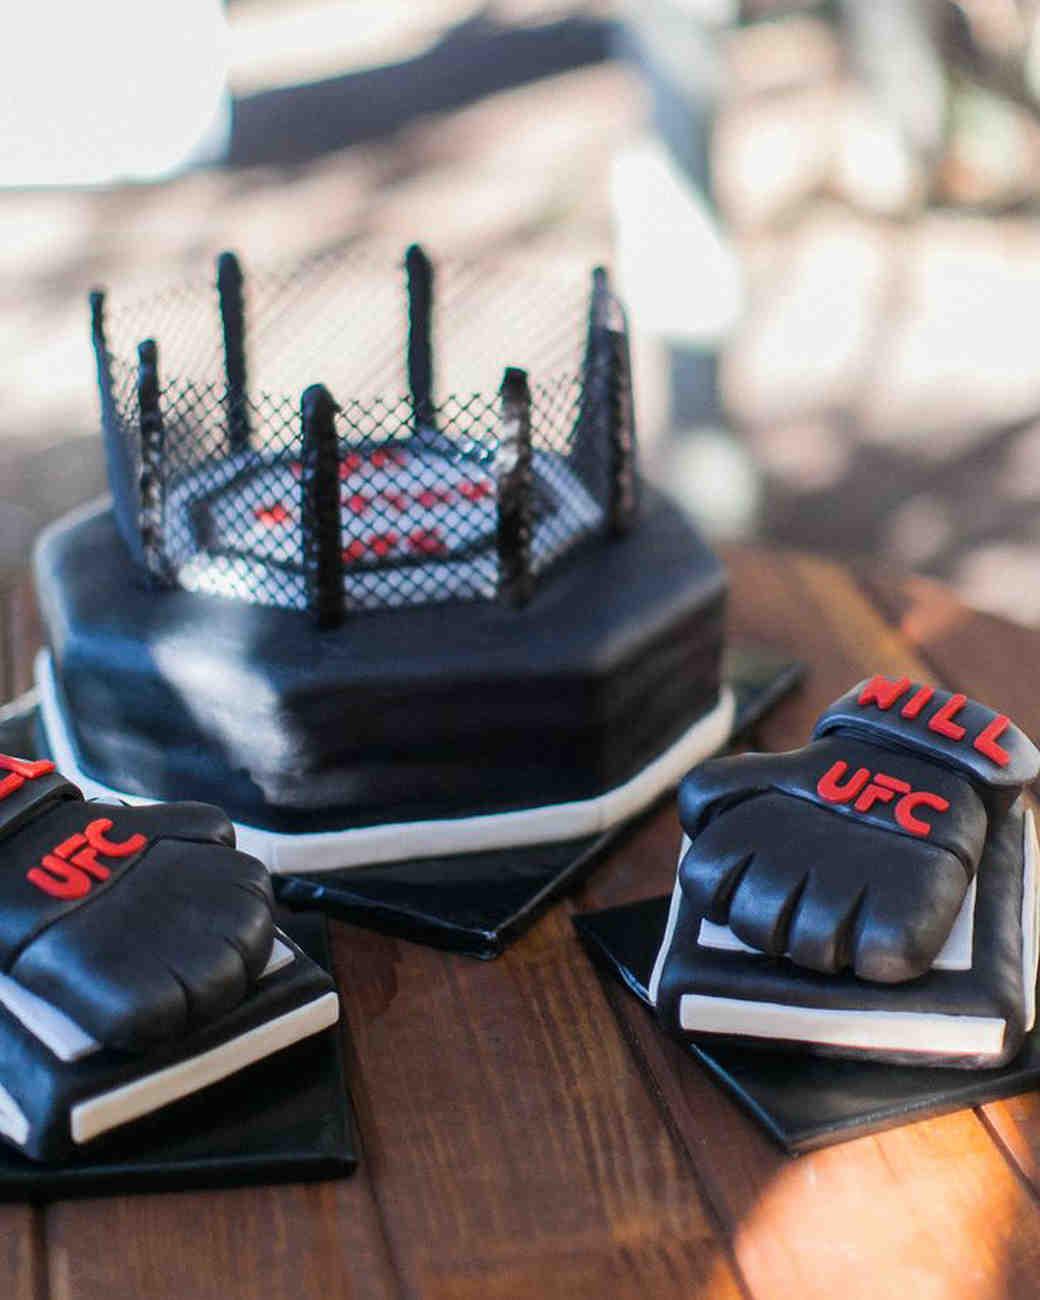 Grooms Wedding Cake Ideas: 24 Unique Ideas For The Groom's Cake